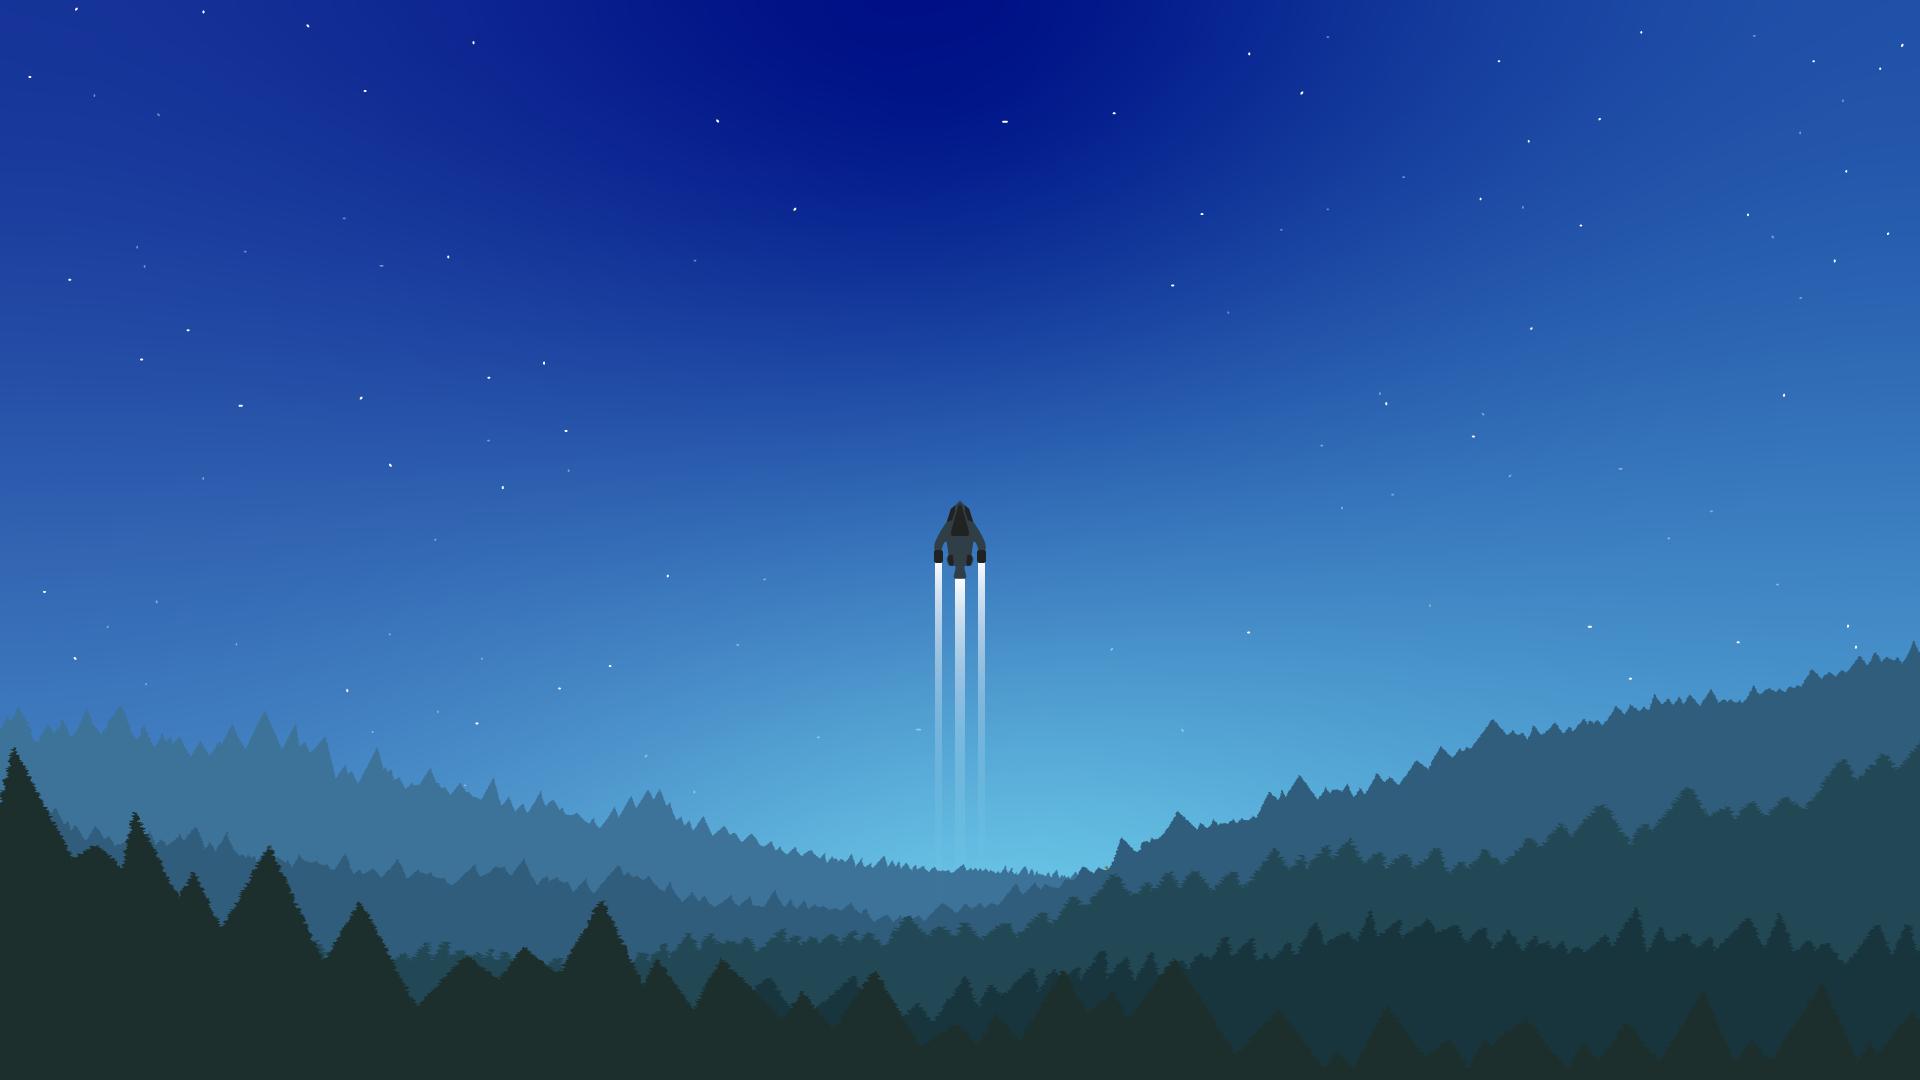 spaceship background wallpaper minimalist for macbook laptop mac windows chromebook